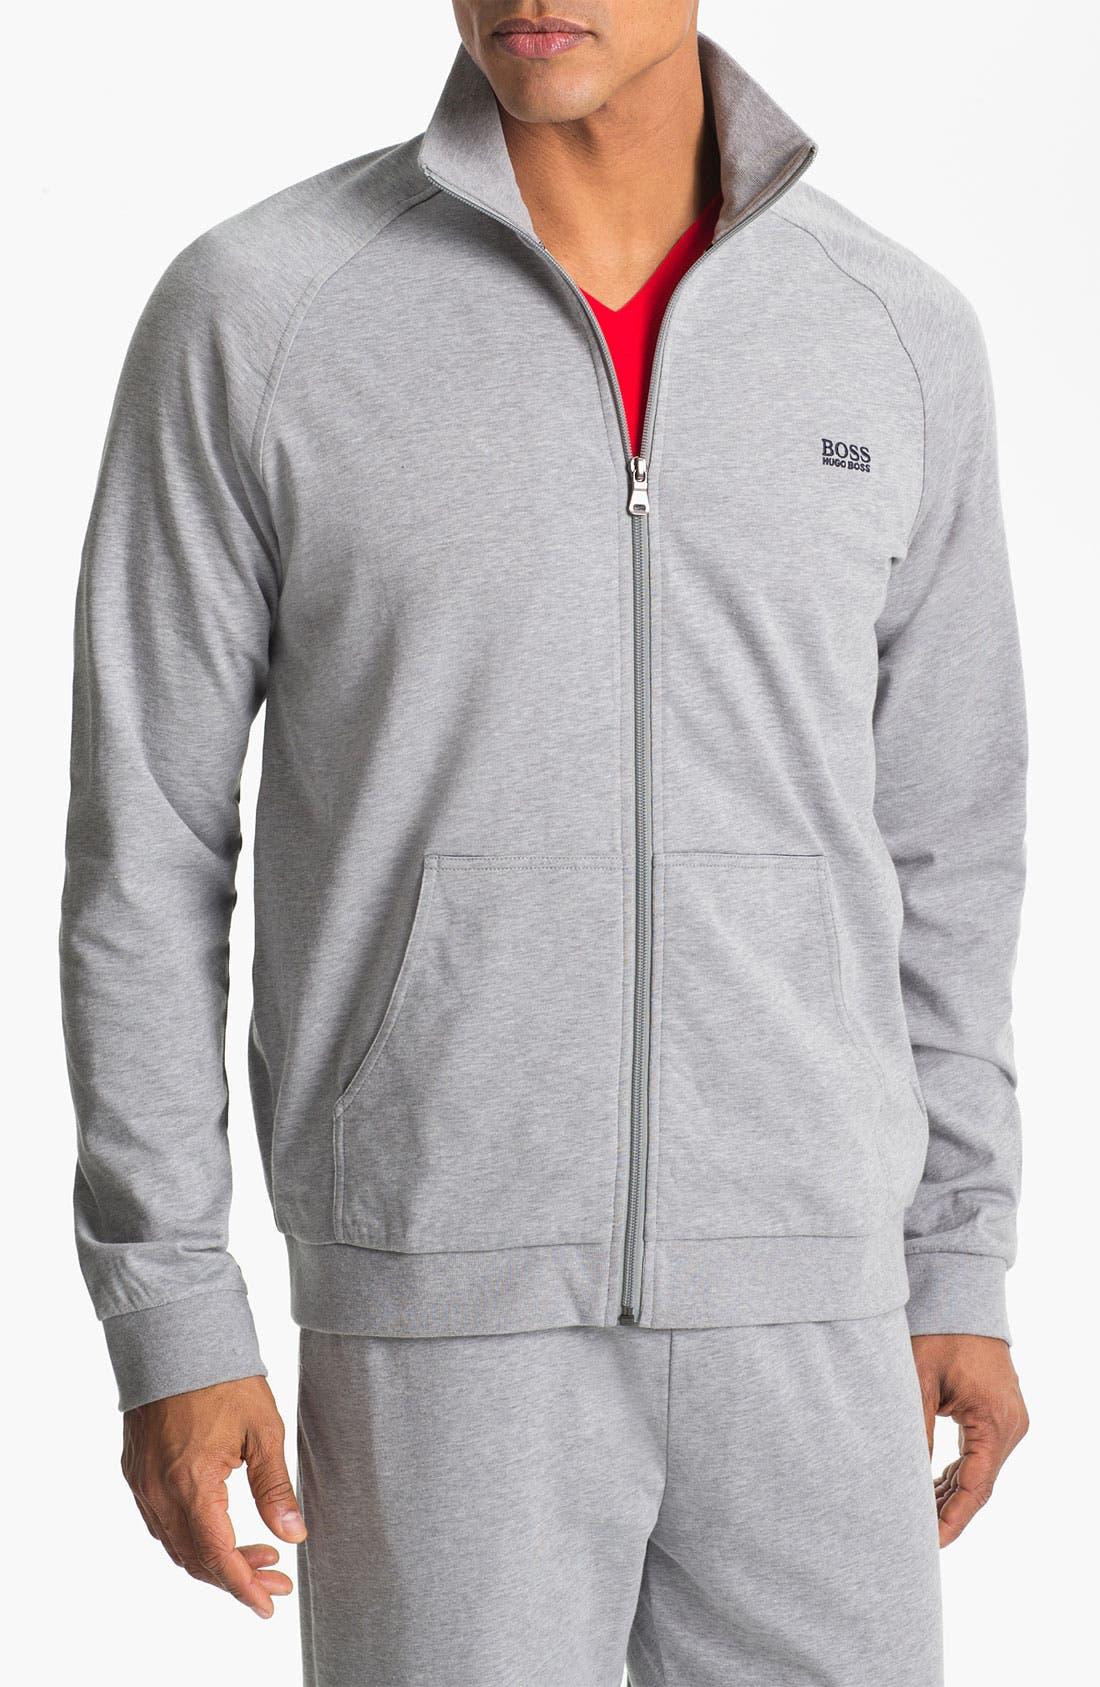 Main Image - BOSS HUGO BOSS 'Innovation' Full Zip Cotton Track Jacket